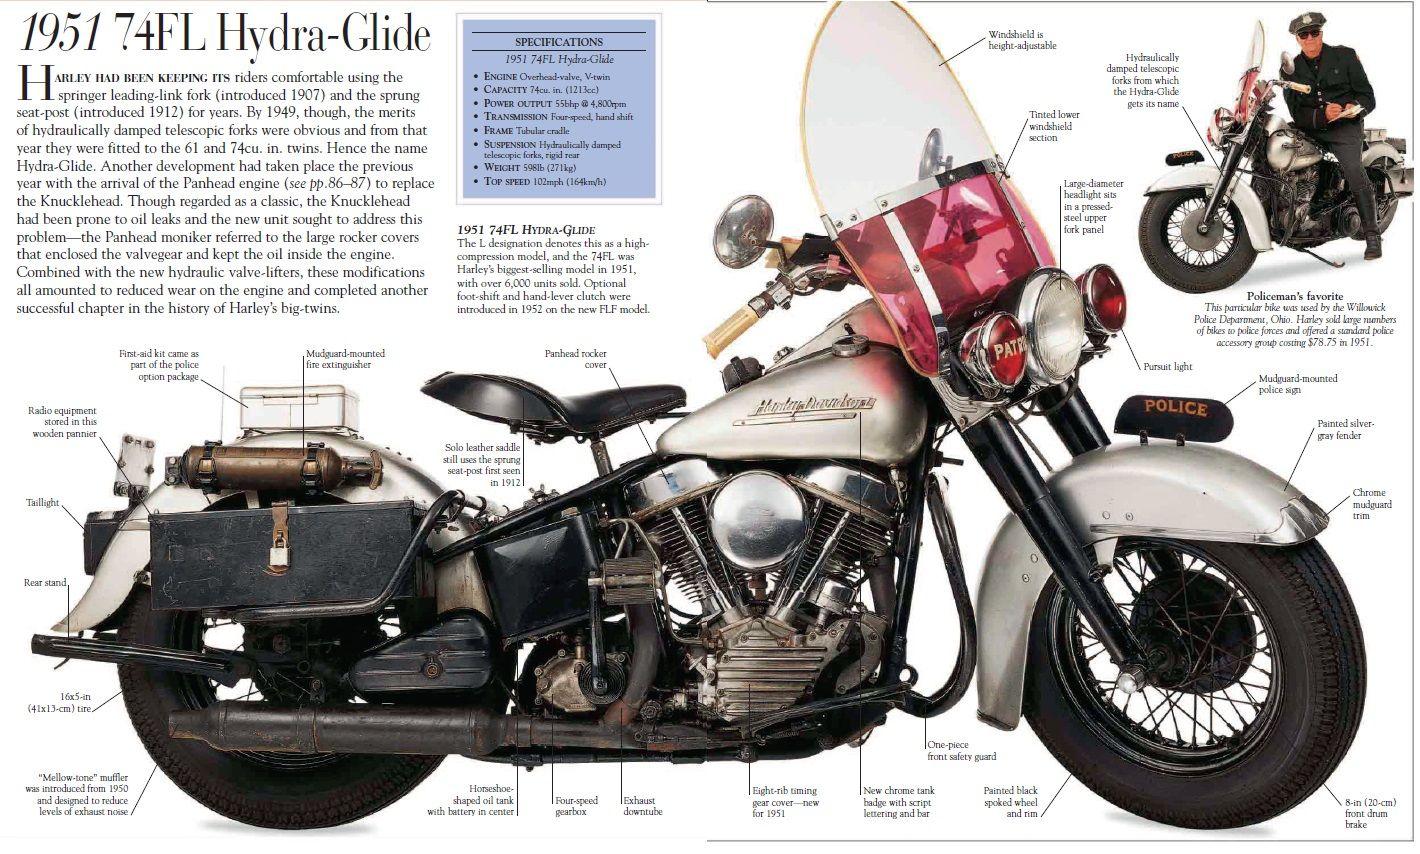 Hydra Glide Harley Davidson Motorcycles Harley Davidson Engines Old Harley Davidson